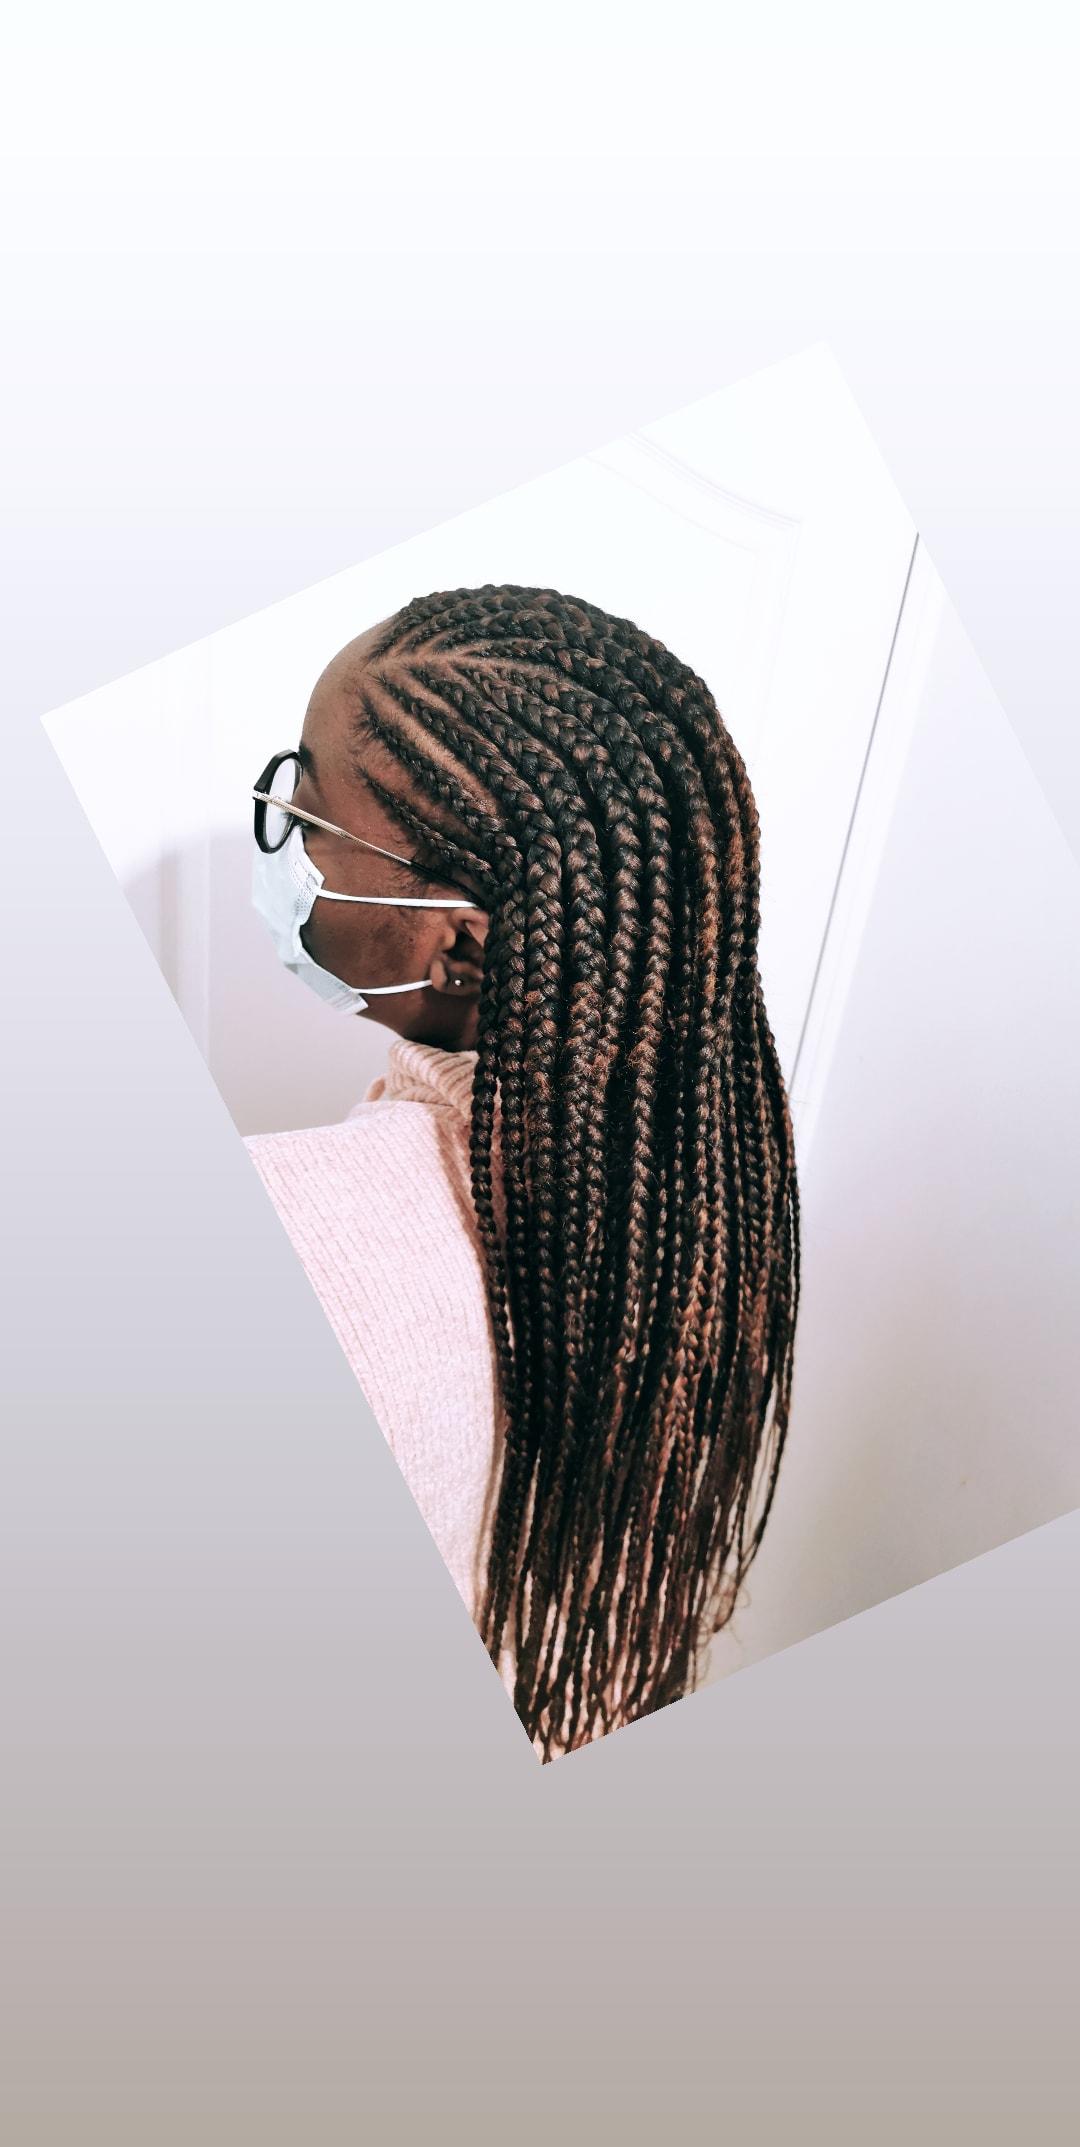 salon de coiffure afro tresse tresses box braids crochet braids vanilles tissages paris 75 77 78 91 92 93 94 95 BNFNRQOJ